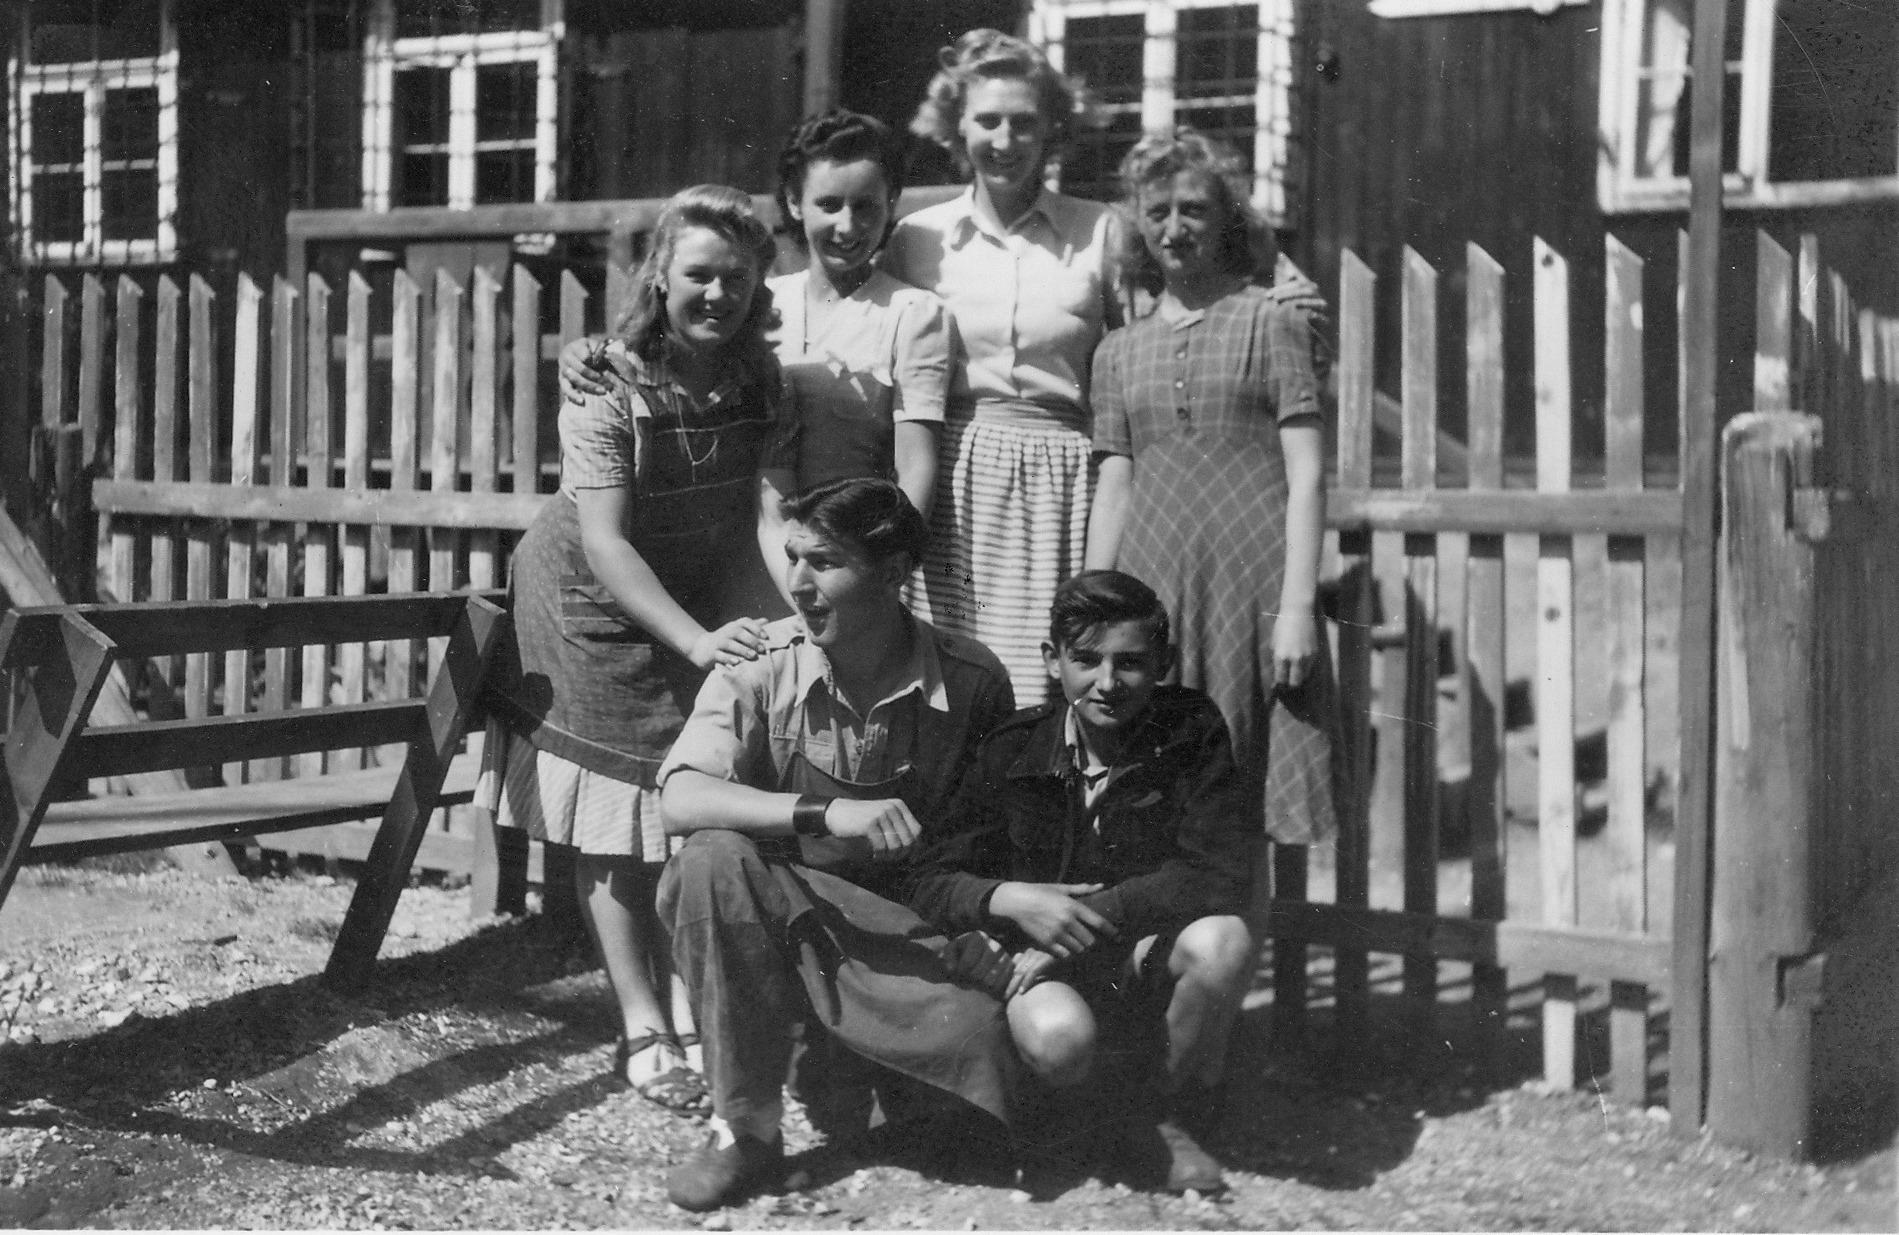 Eisenerz staff, Back L-R Leni, Frau Mosaner, Clare, Freidl, Front row - Gustav, Dushkov, Sept.1948